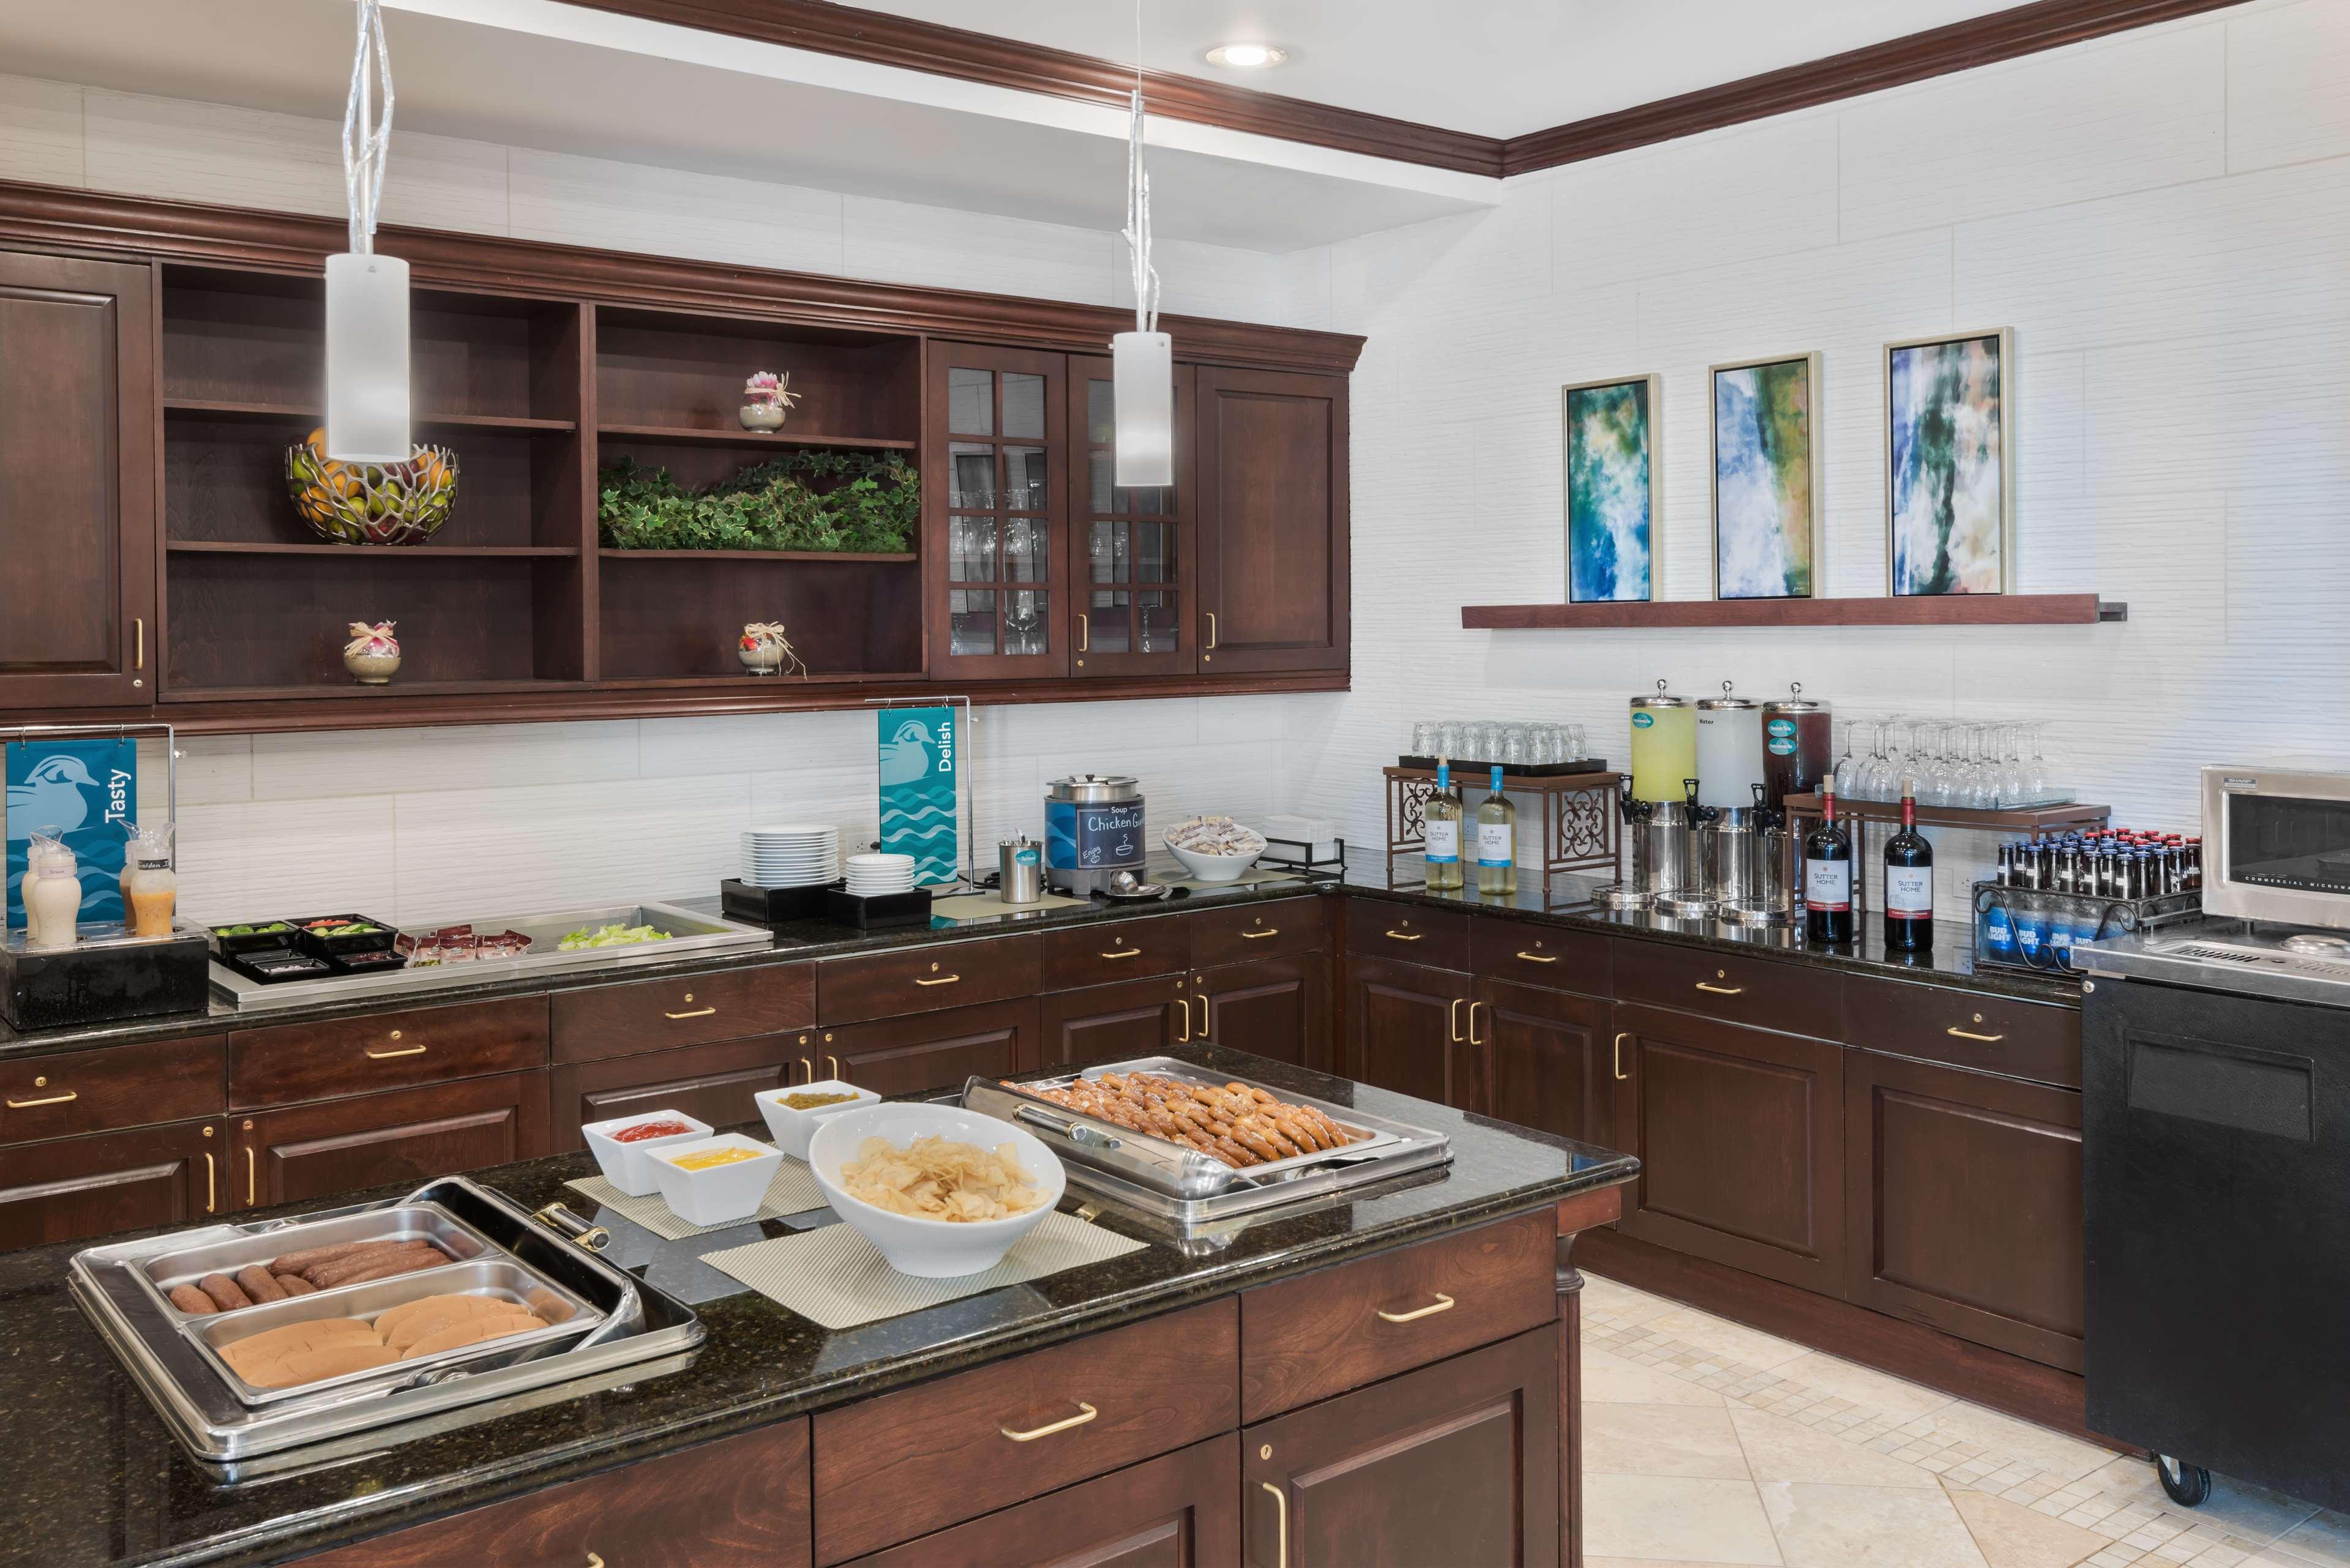 Homewood Suites by Hilton Holyoke-Springfield/North image 9